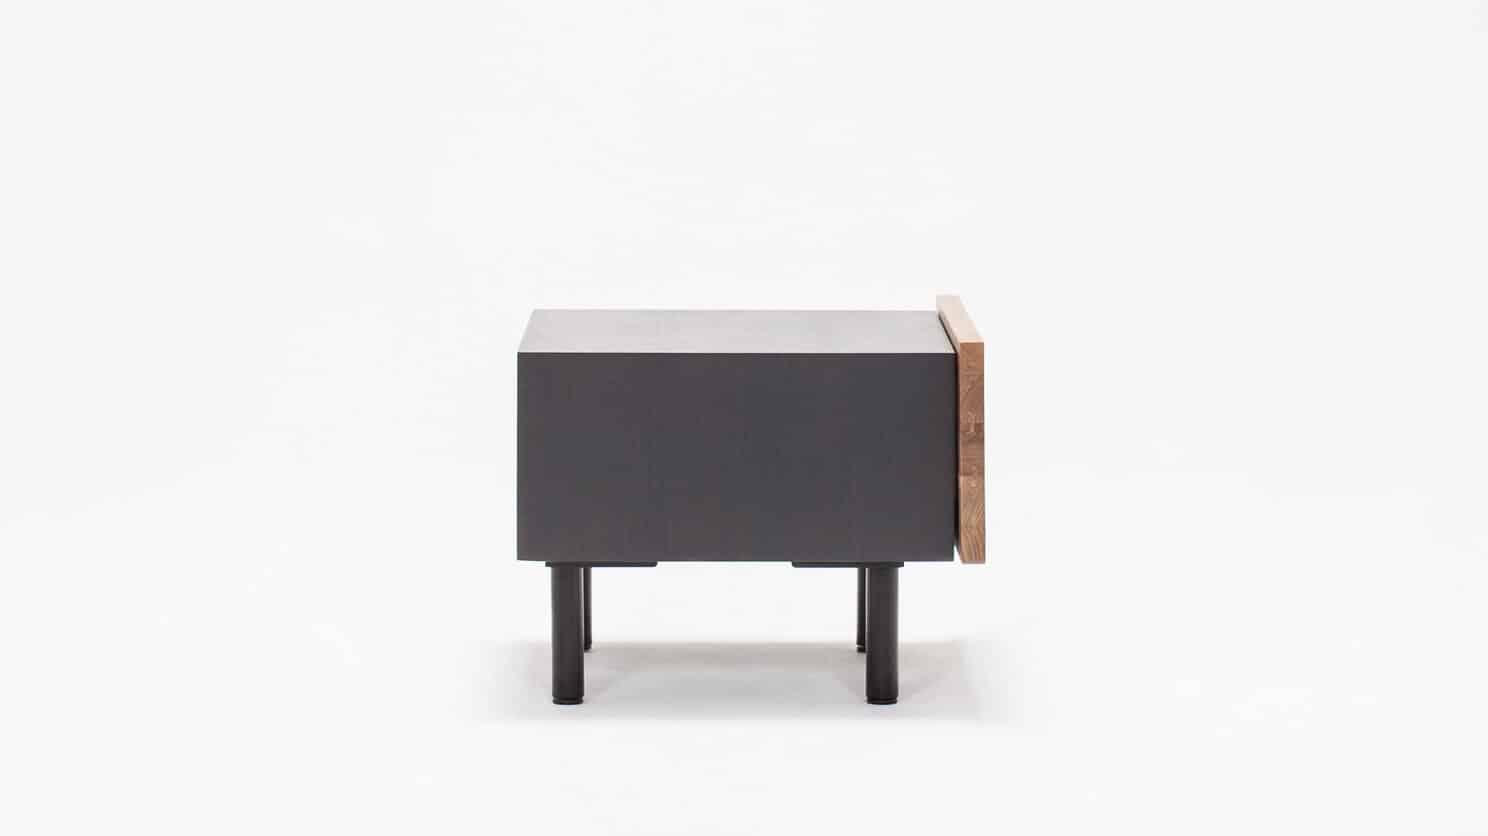 7040 431 par 7 nightstands reclaimed teak nightstand charcoal side 01